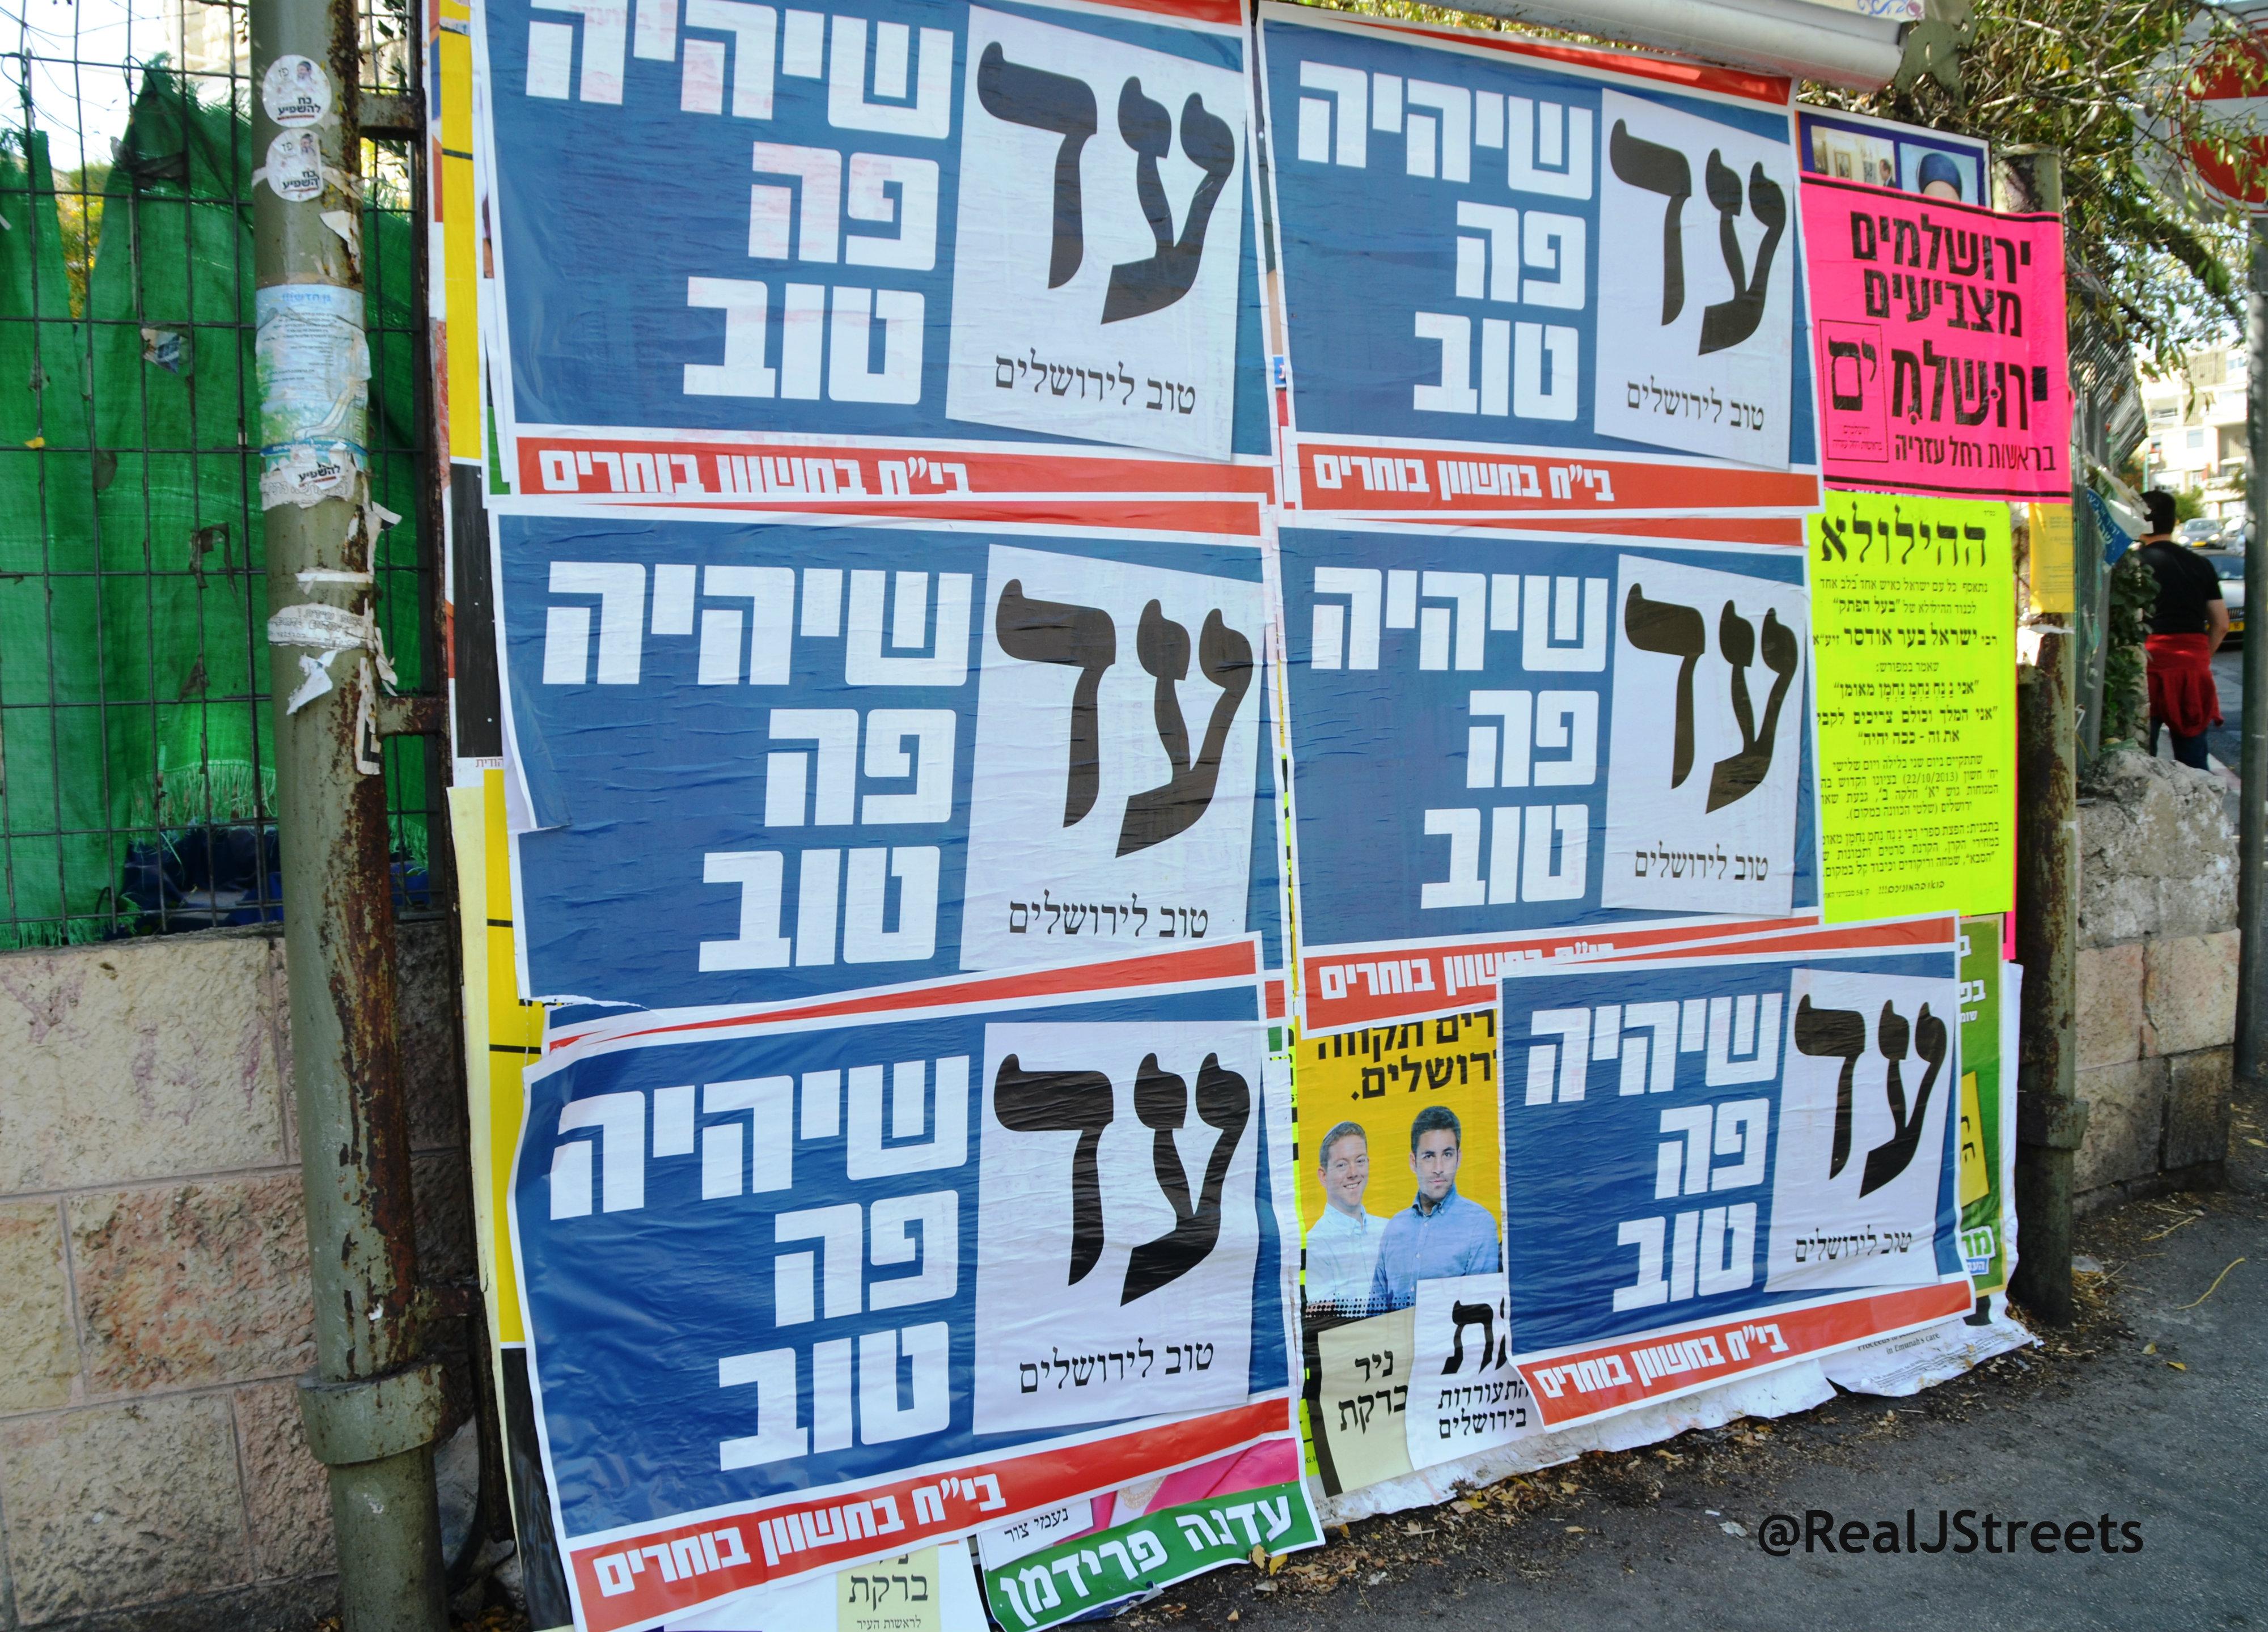 Israel municipal elections image